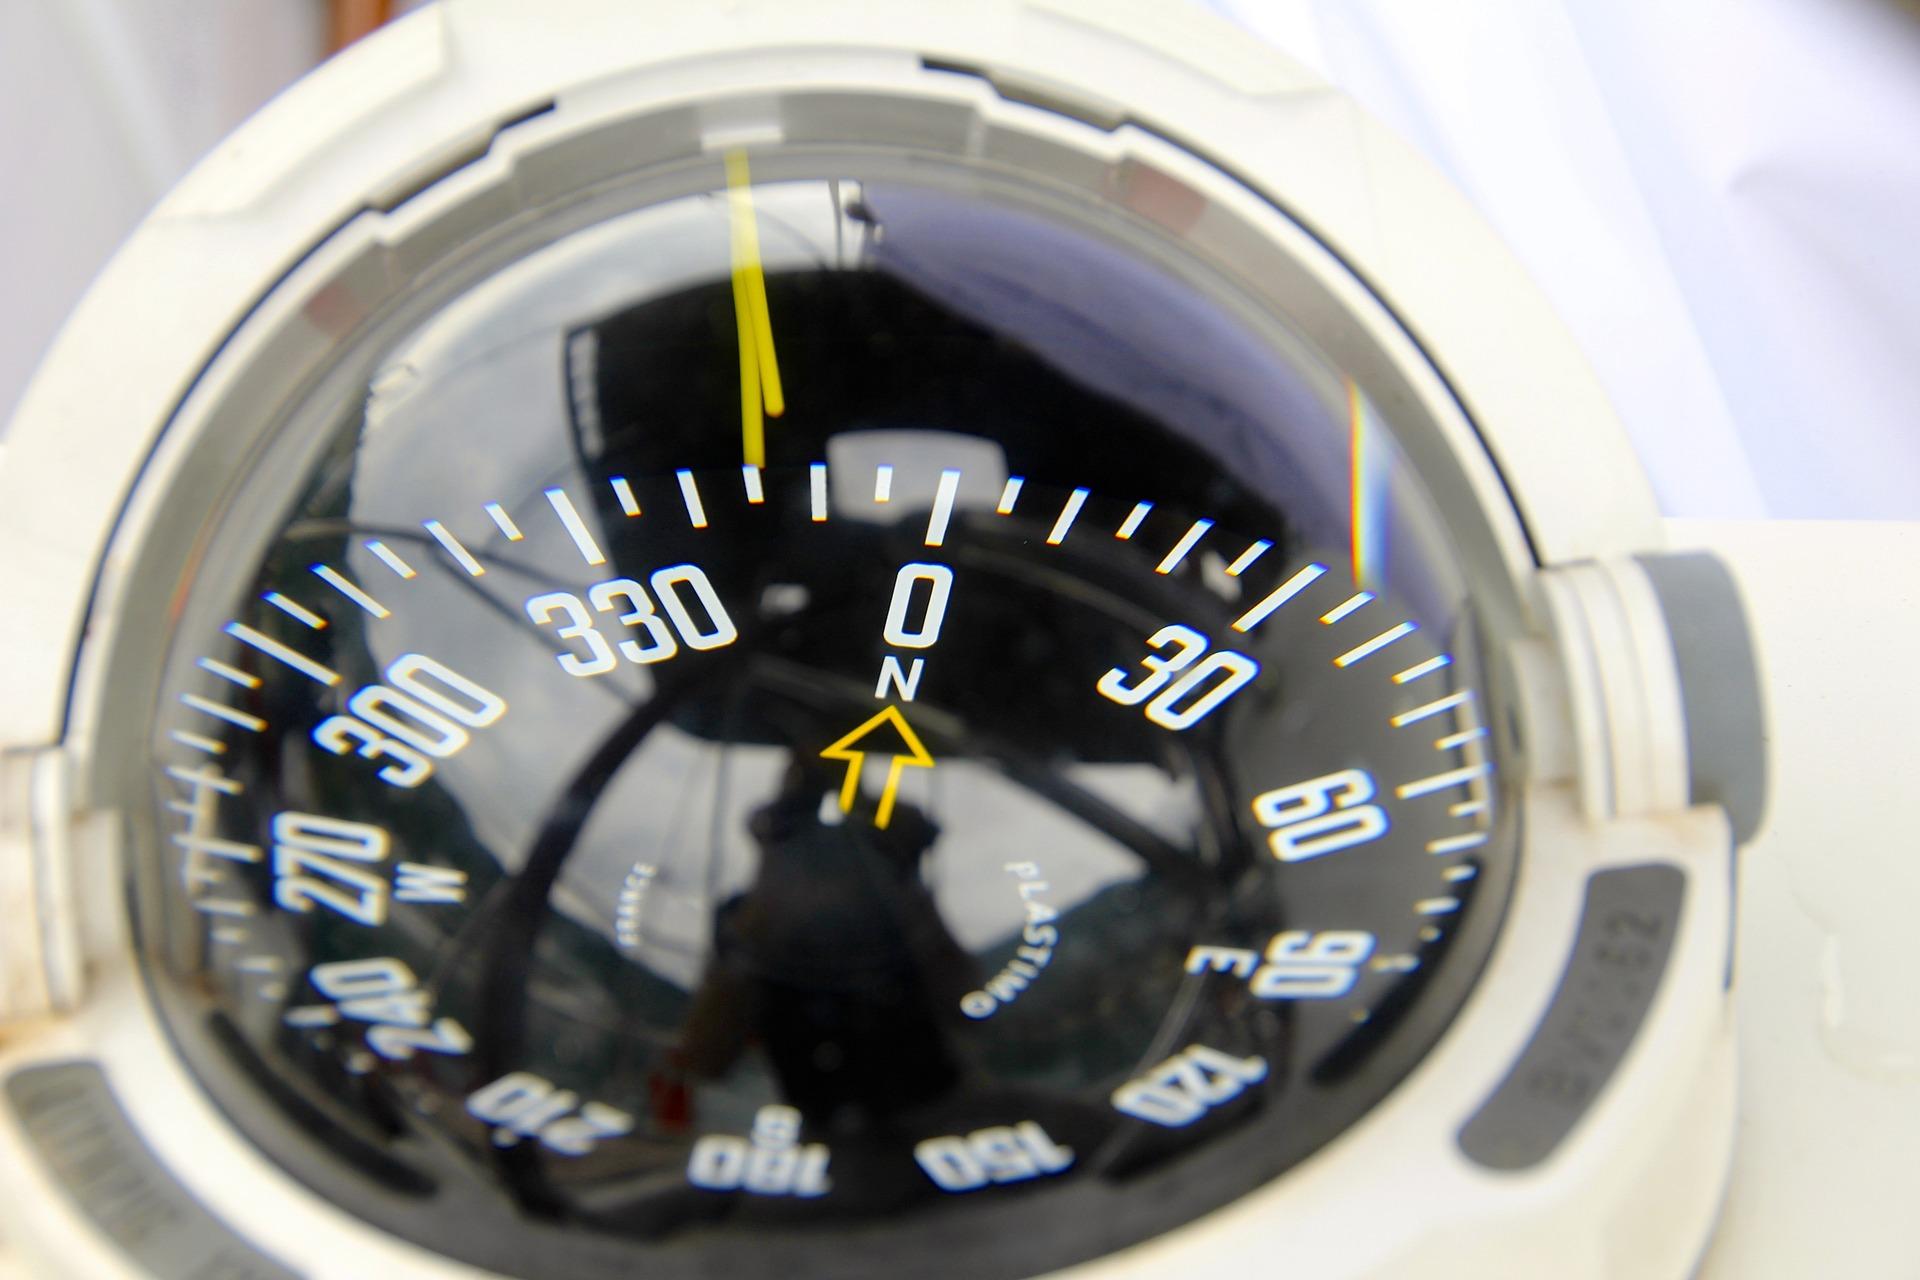 compass-1028422_1920